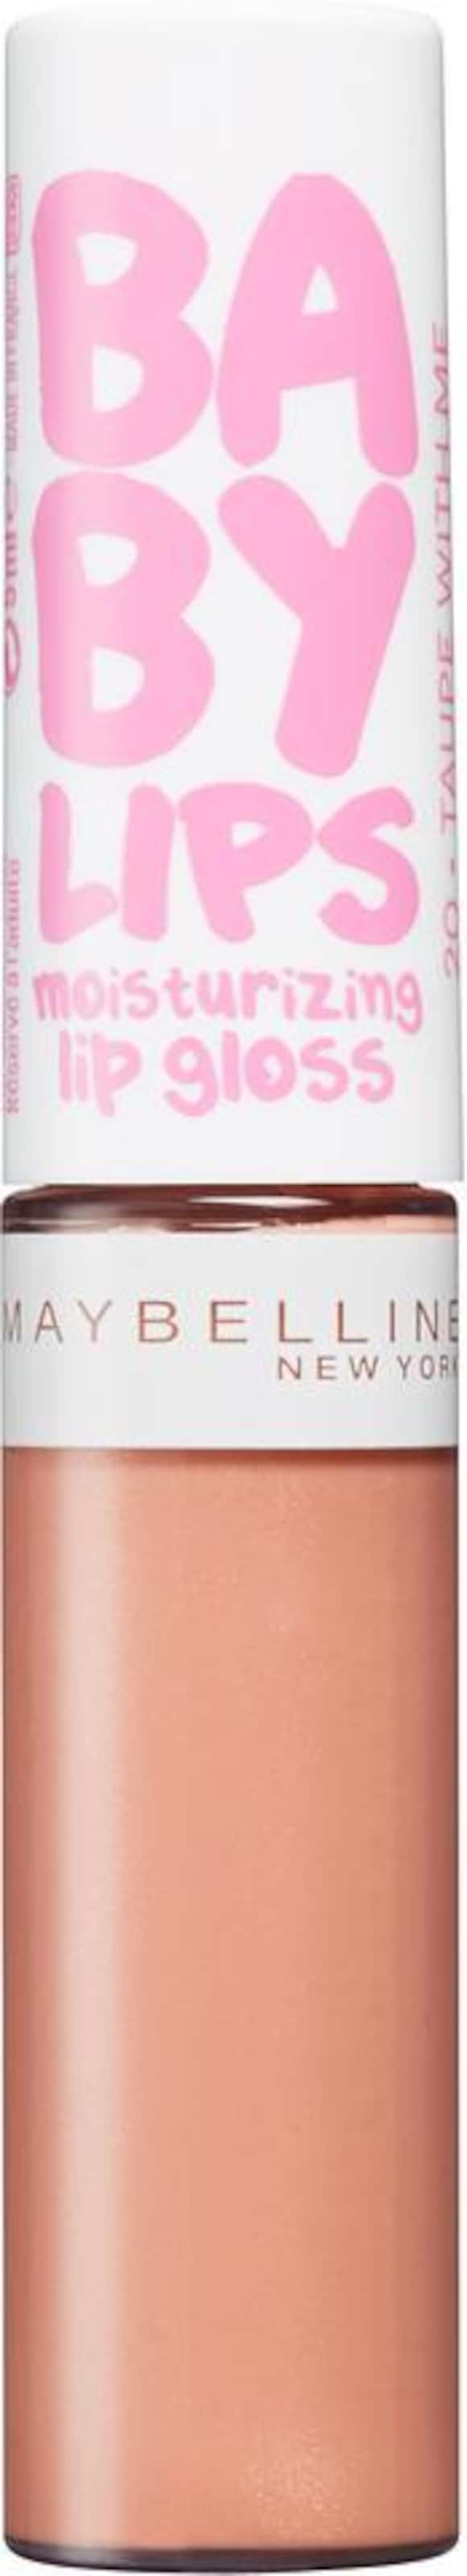 MAYBELLINE New York 'Baby Lips Gloss', Lipgloss